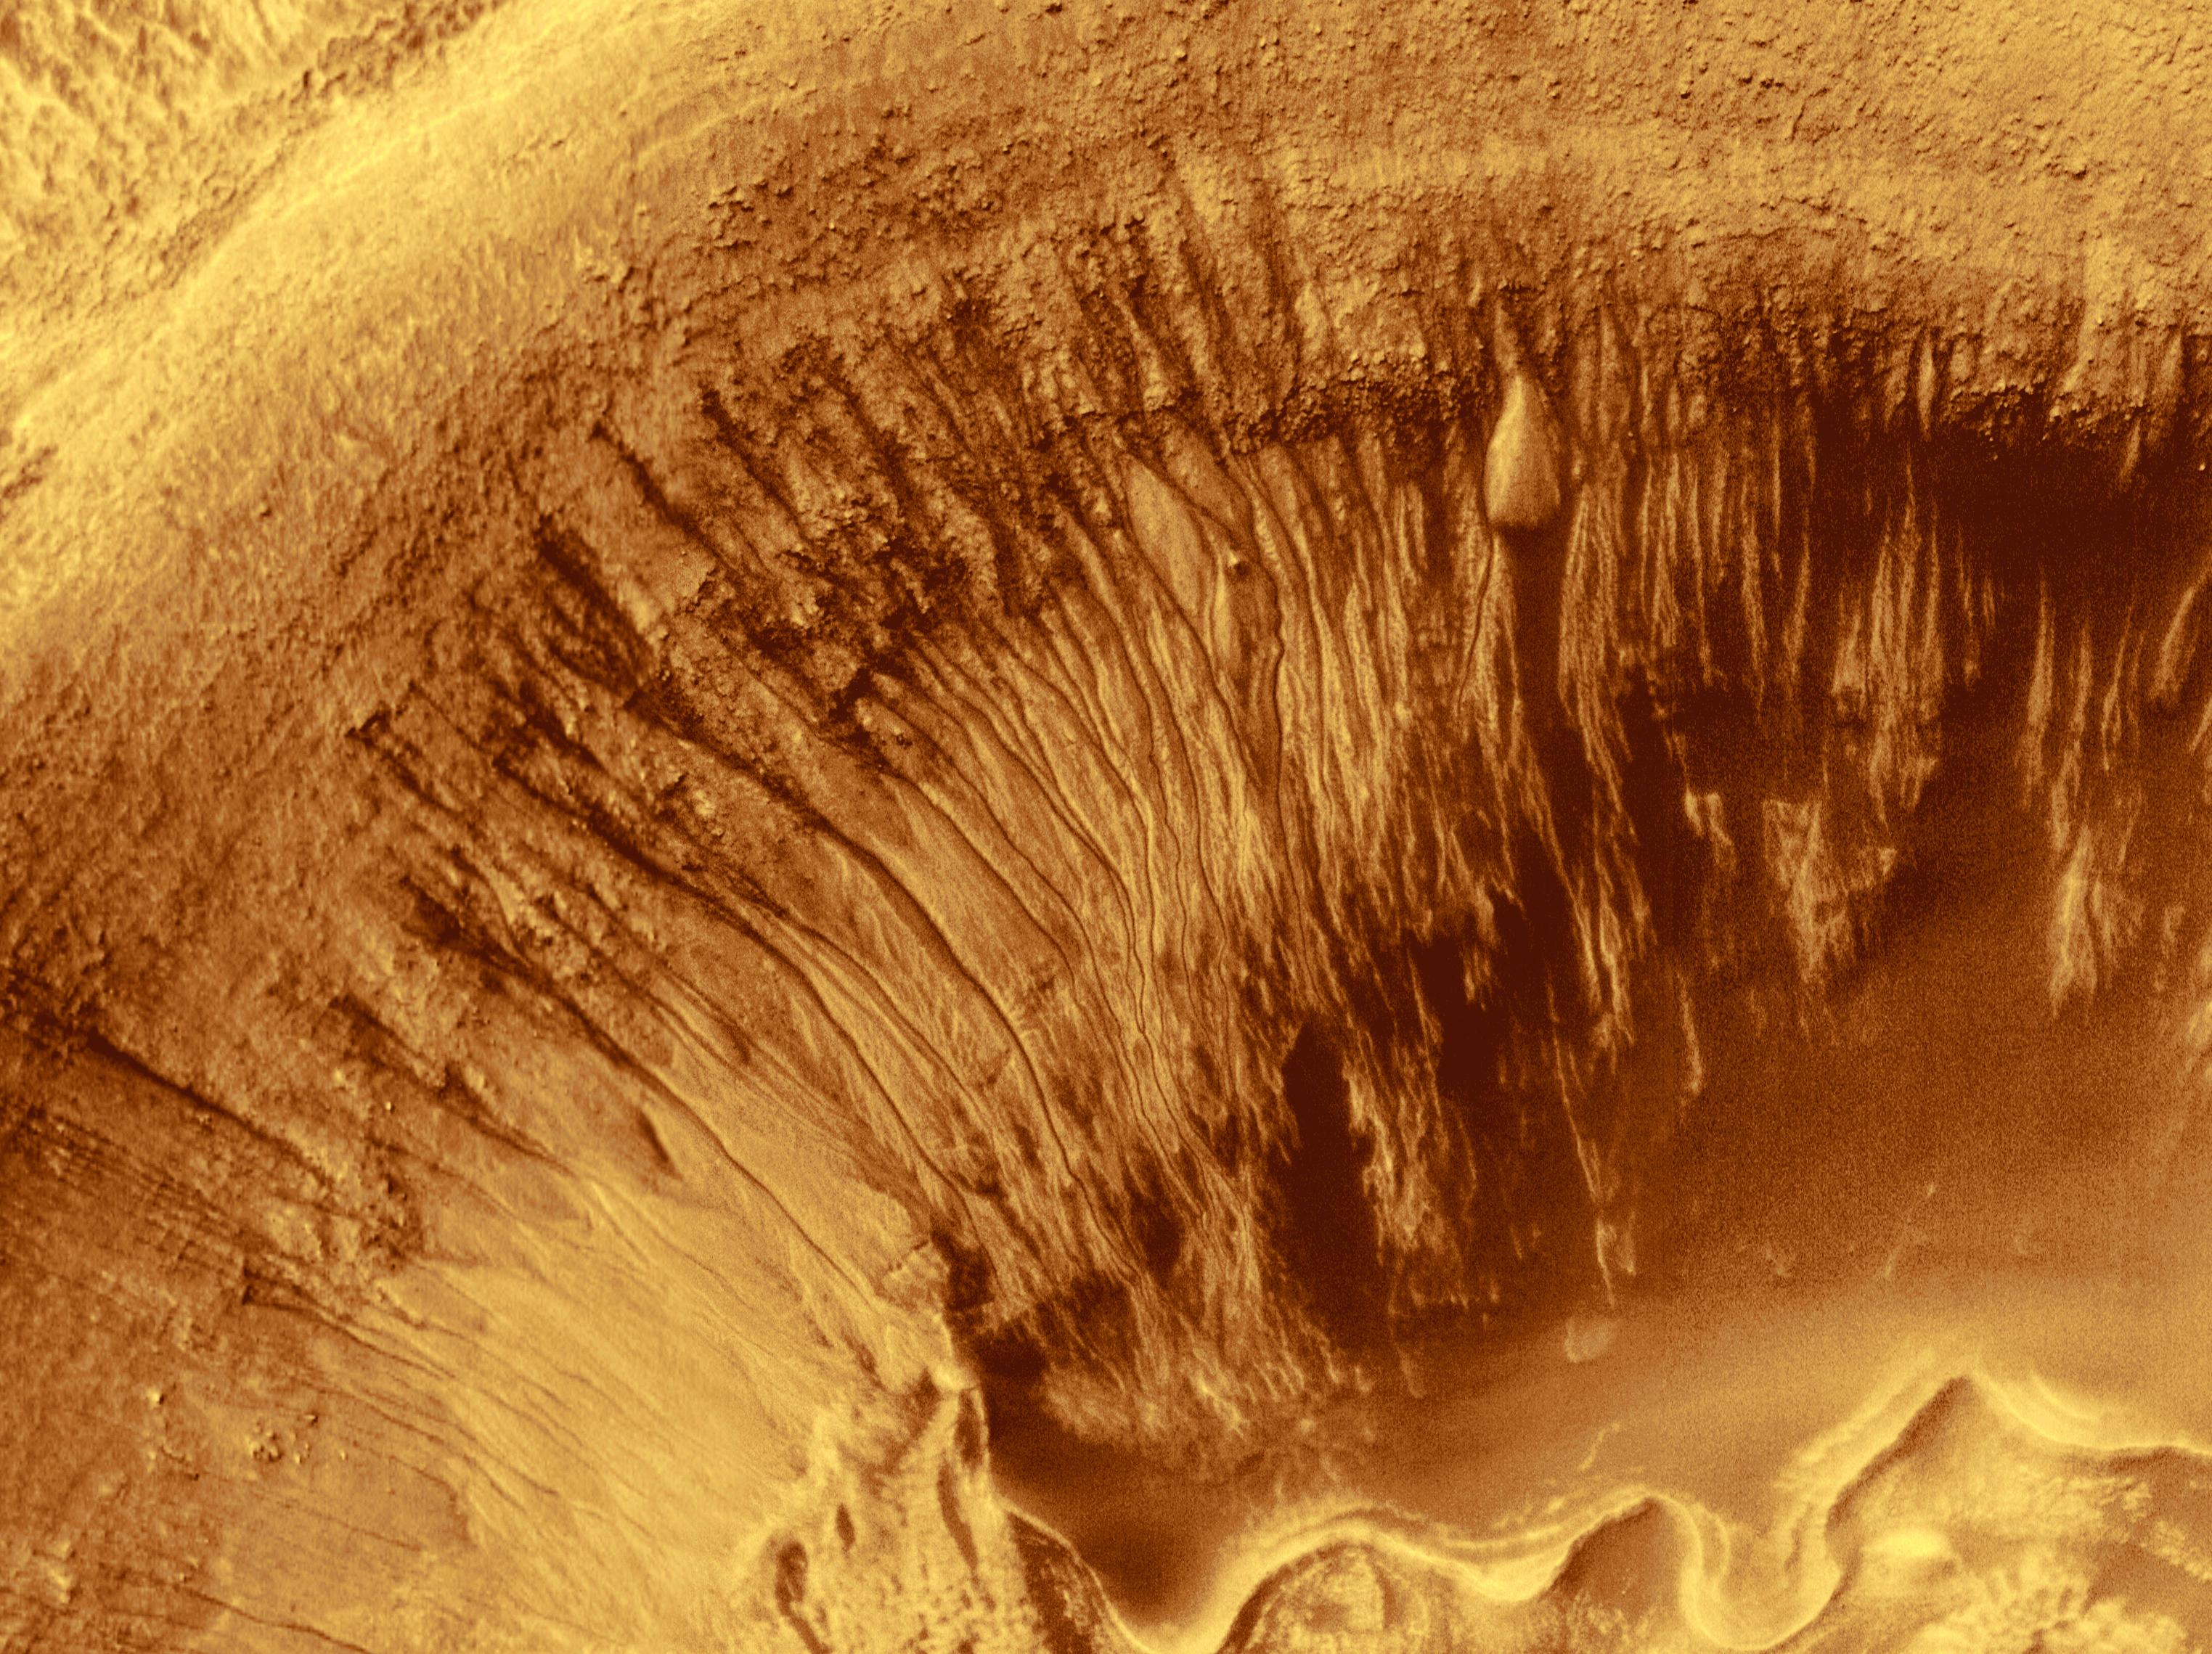 Mars cratere